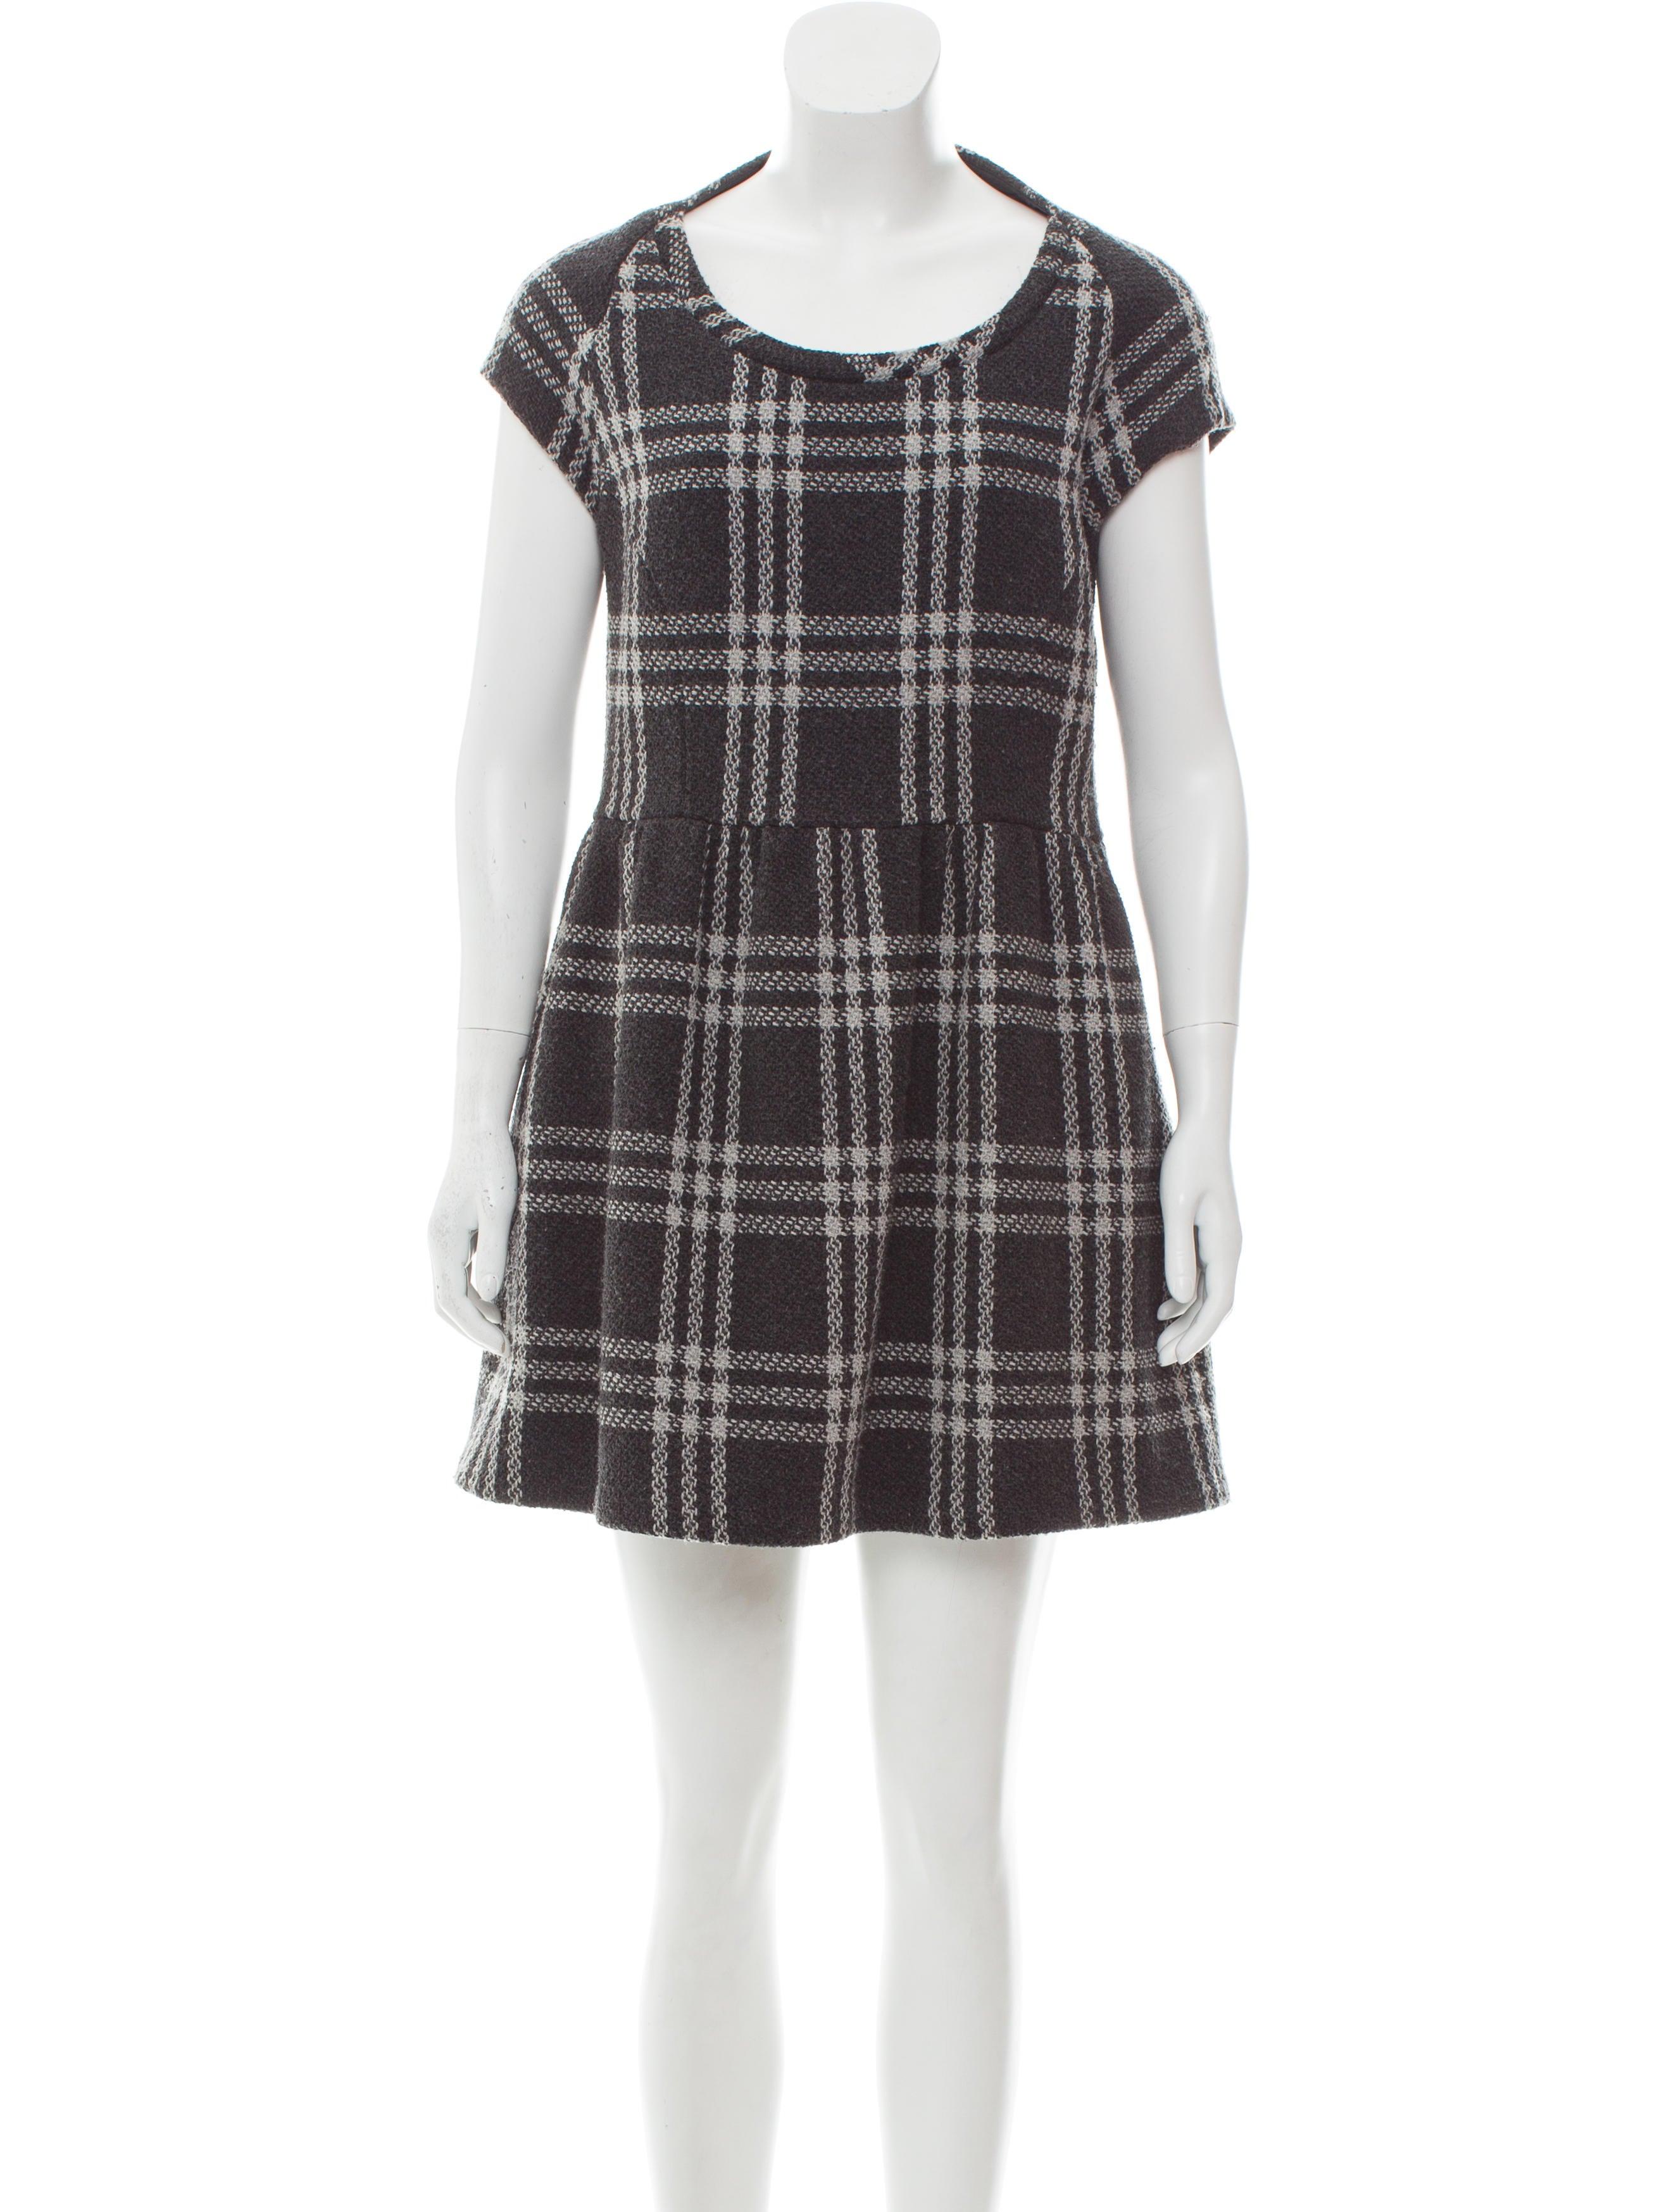 Geren Ford Vintage Plaid Dress - Clothing - WGE20023 | The RealReal